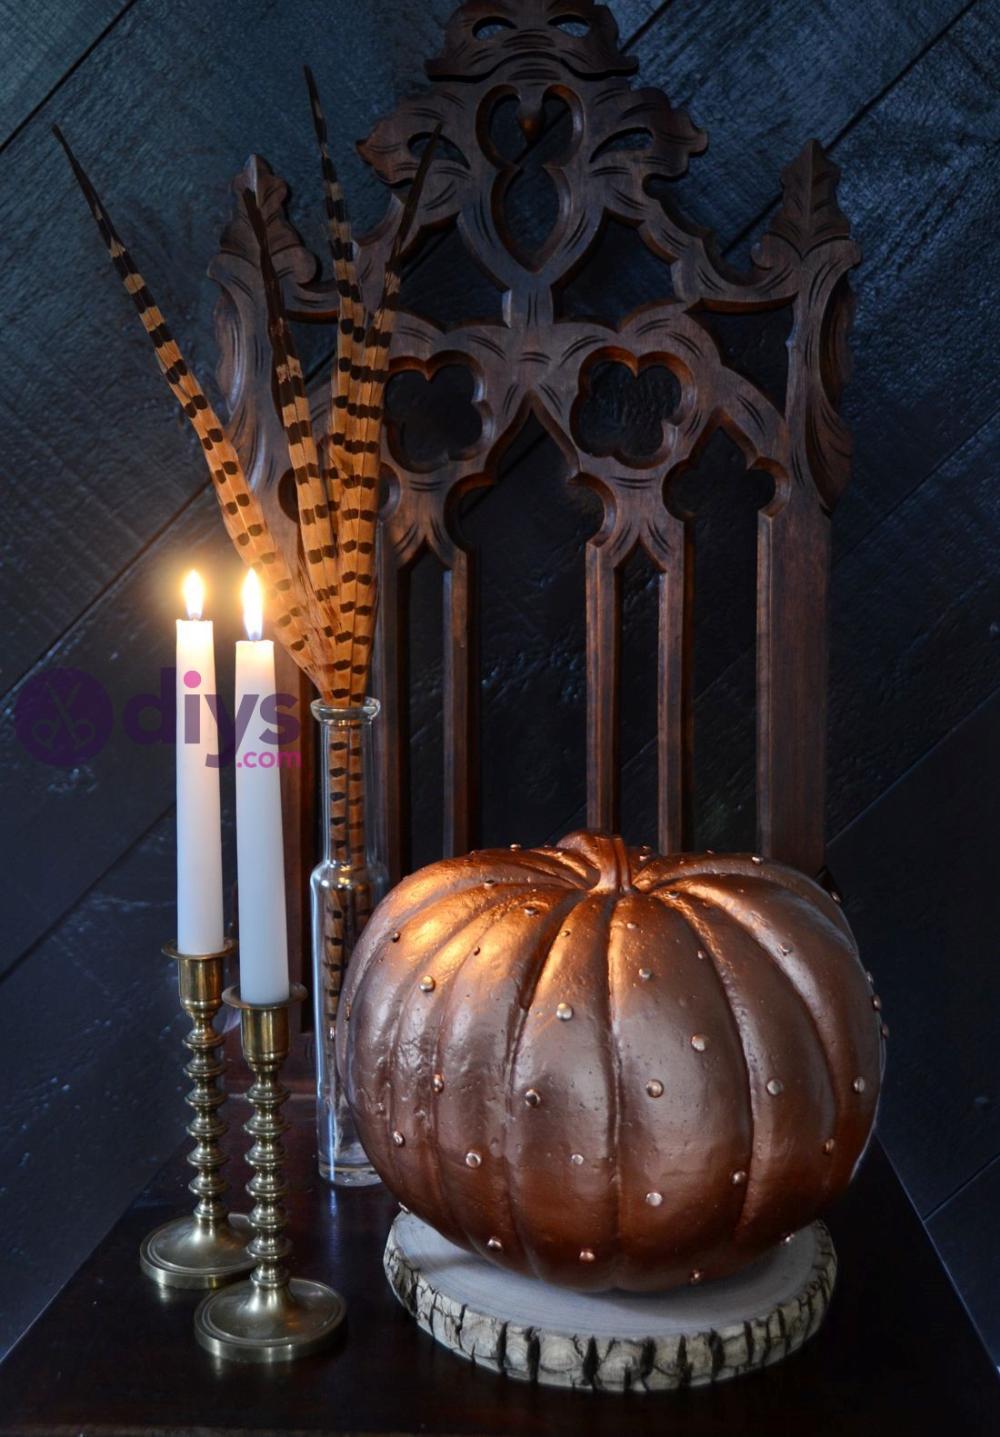 Glamorous copper cool pumpkin painting ideas